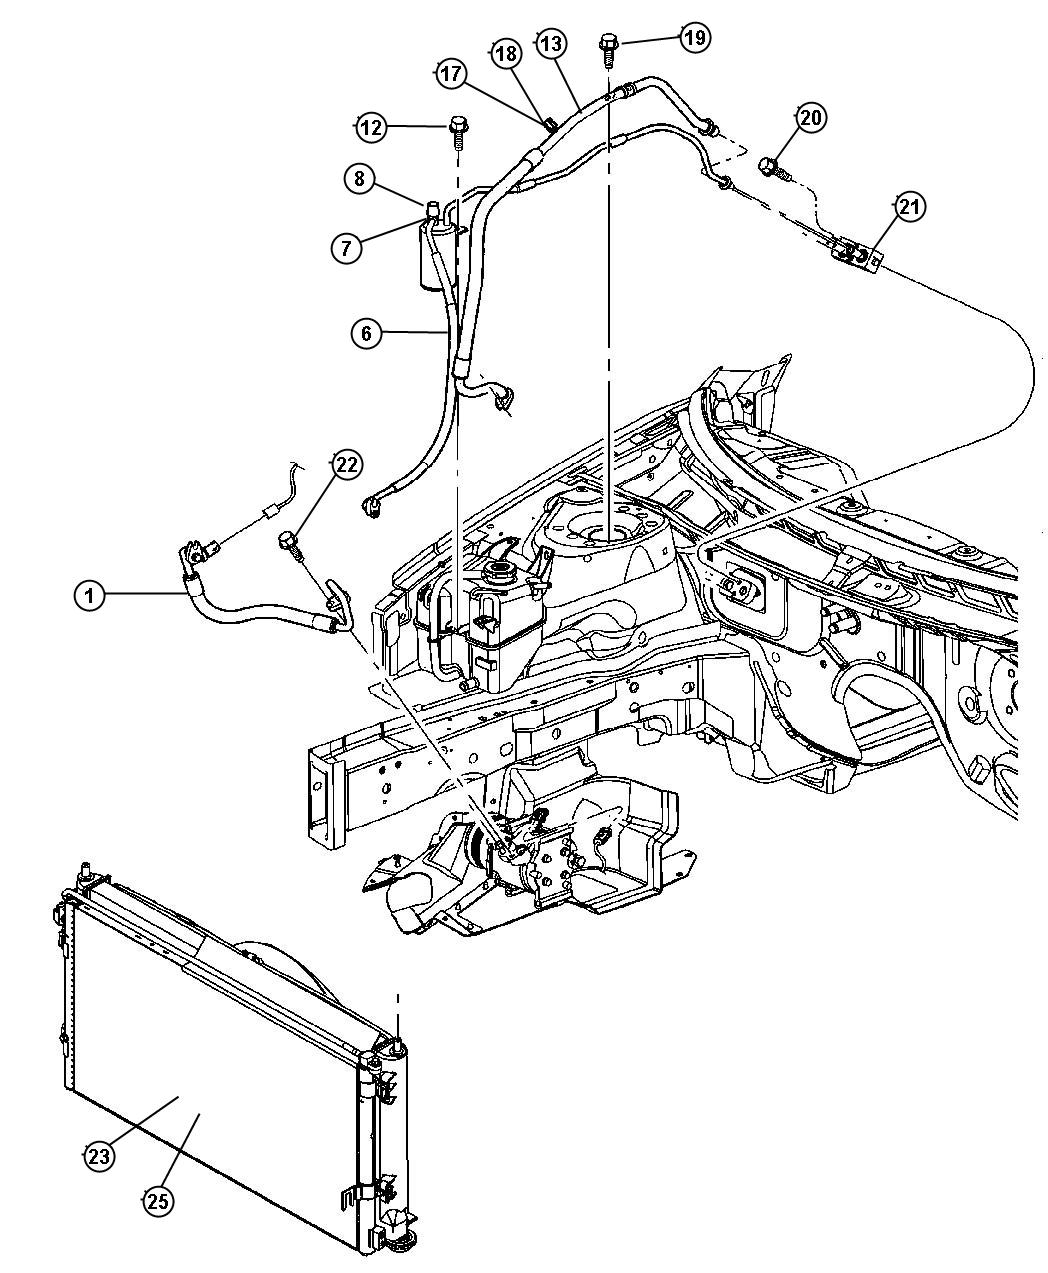 2001 Chrysler Sebring I CONVERTIBLE LX Plumbing, Air